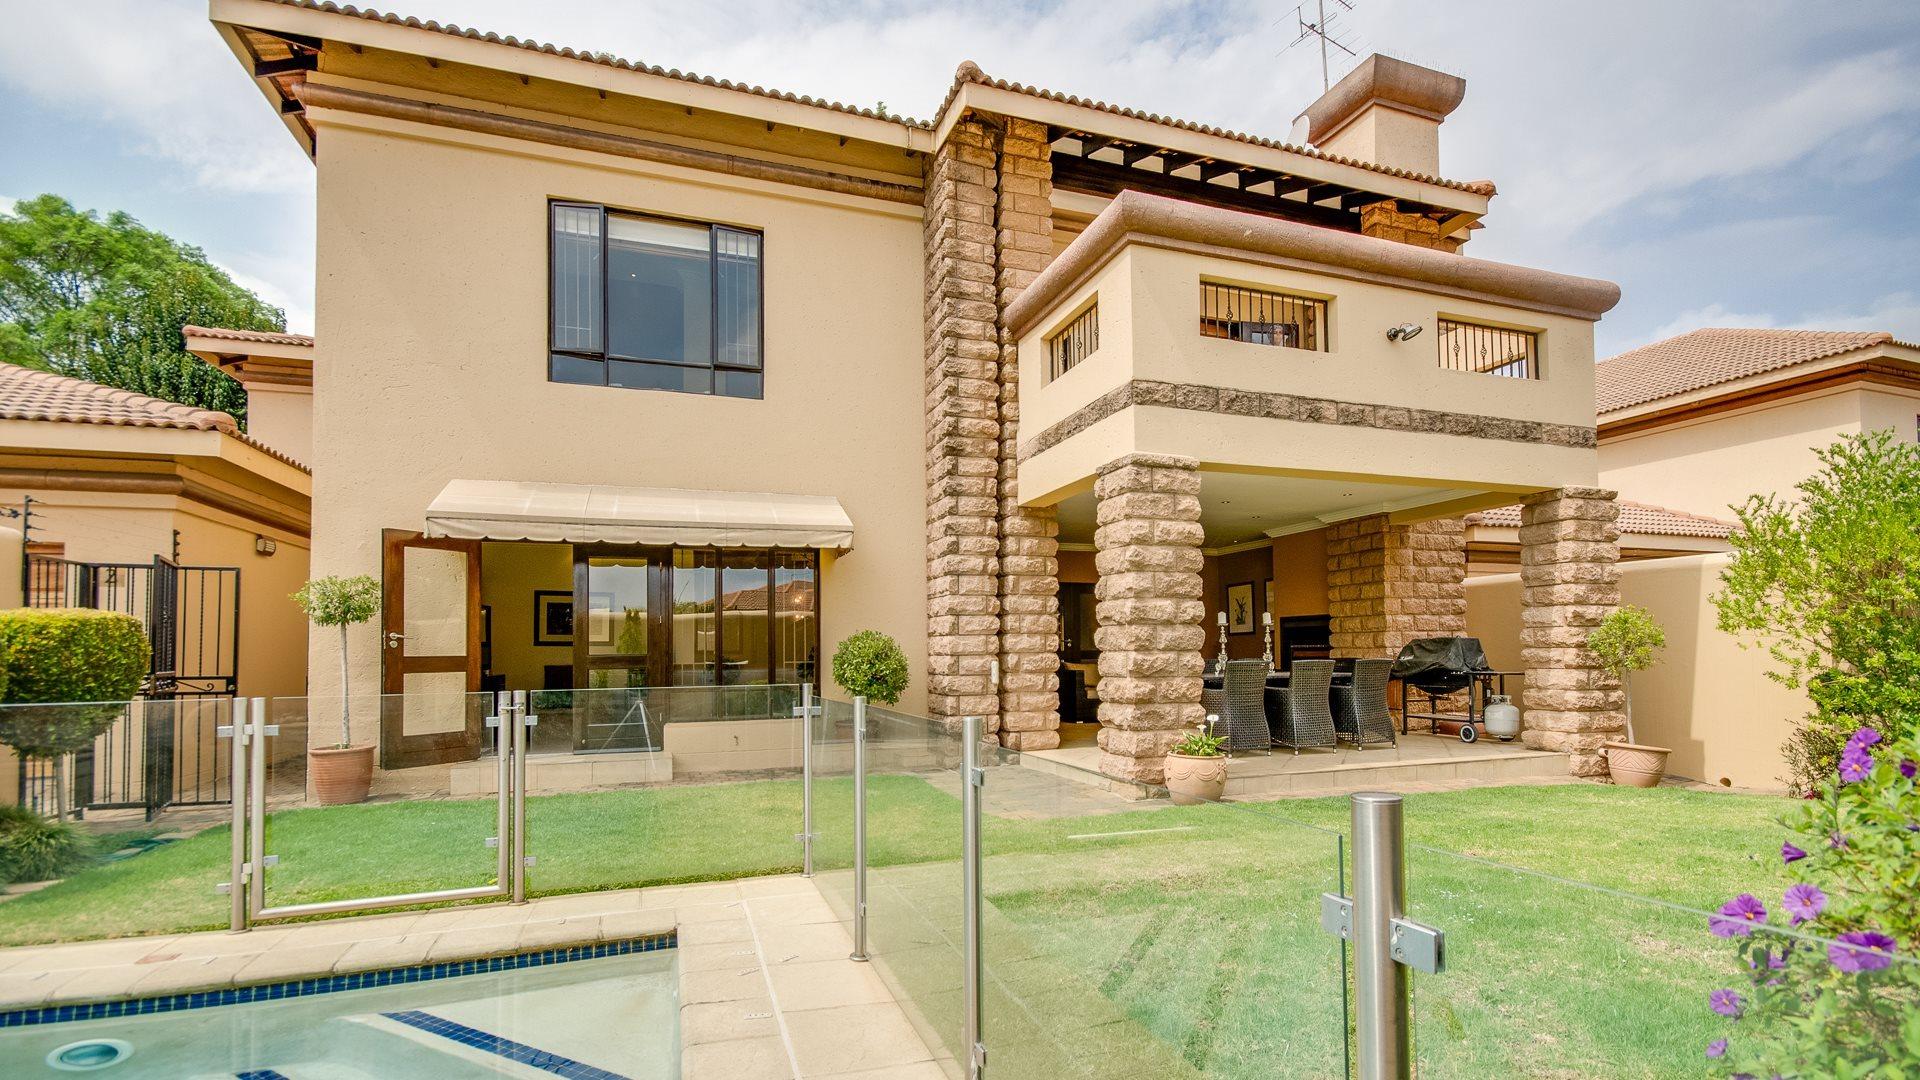 Johannesburg, Waverley Property  | Houses For Sale Waverley, Waverley, House 3 bedrooms property for sale Price:5,699,000